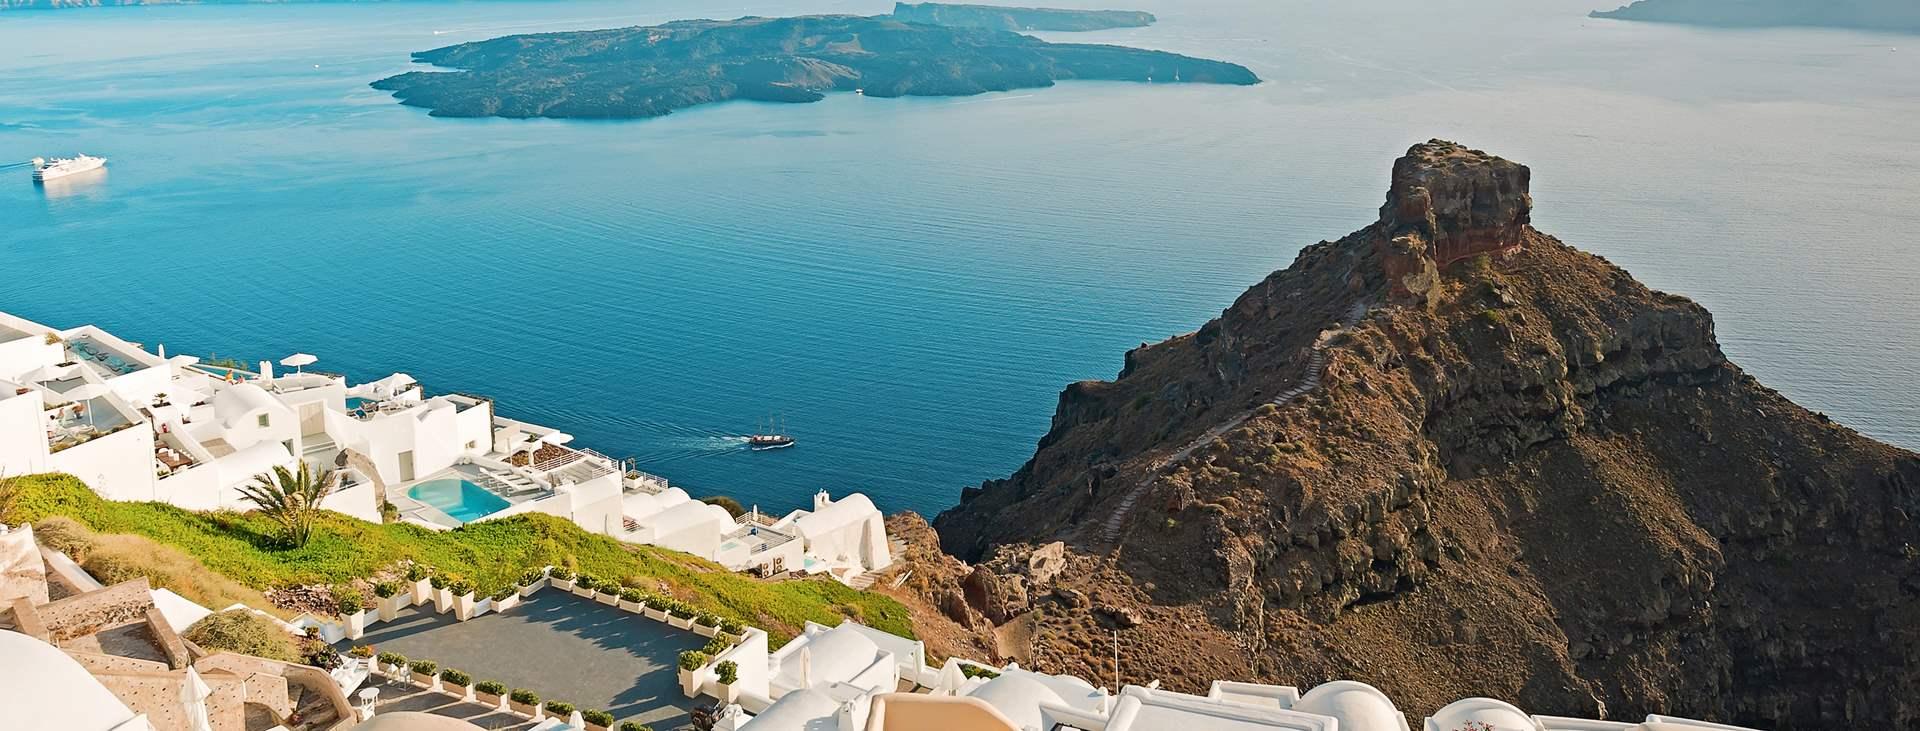 Bestill en reise med Ving til Imerovigli på Santorini i Hellas